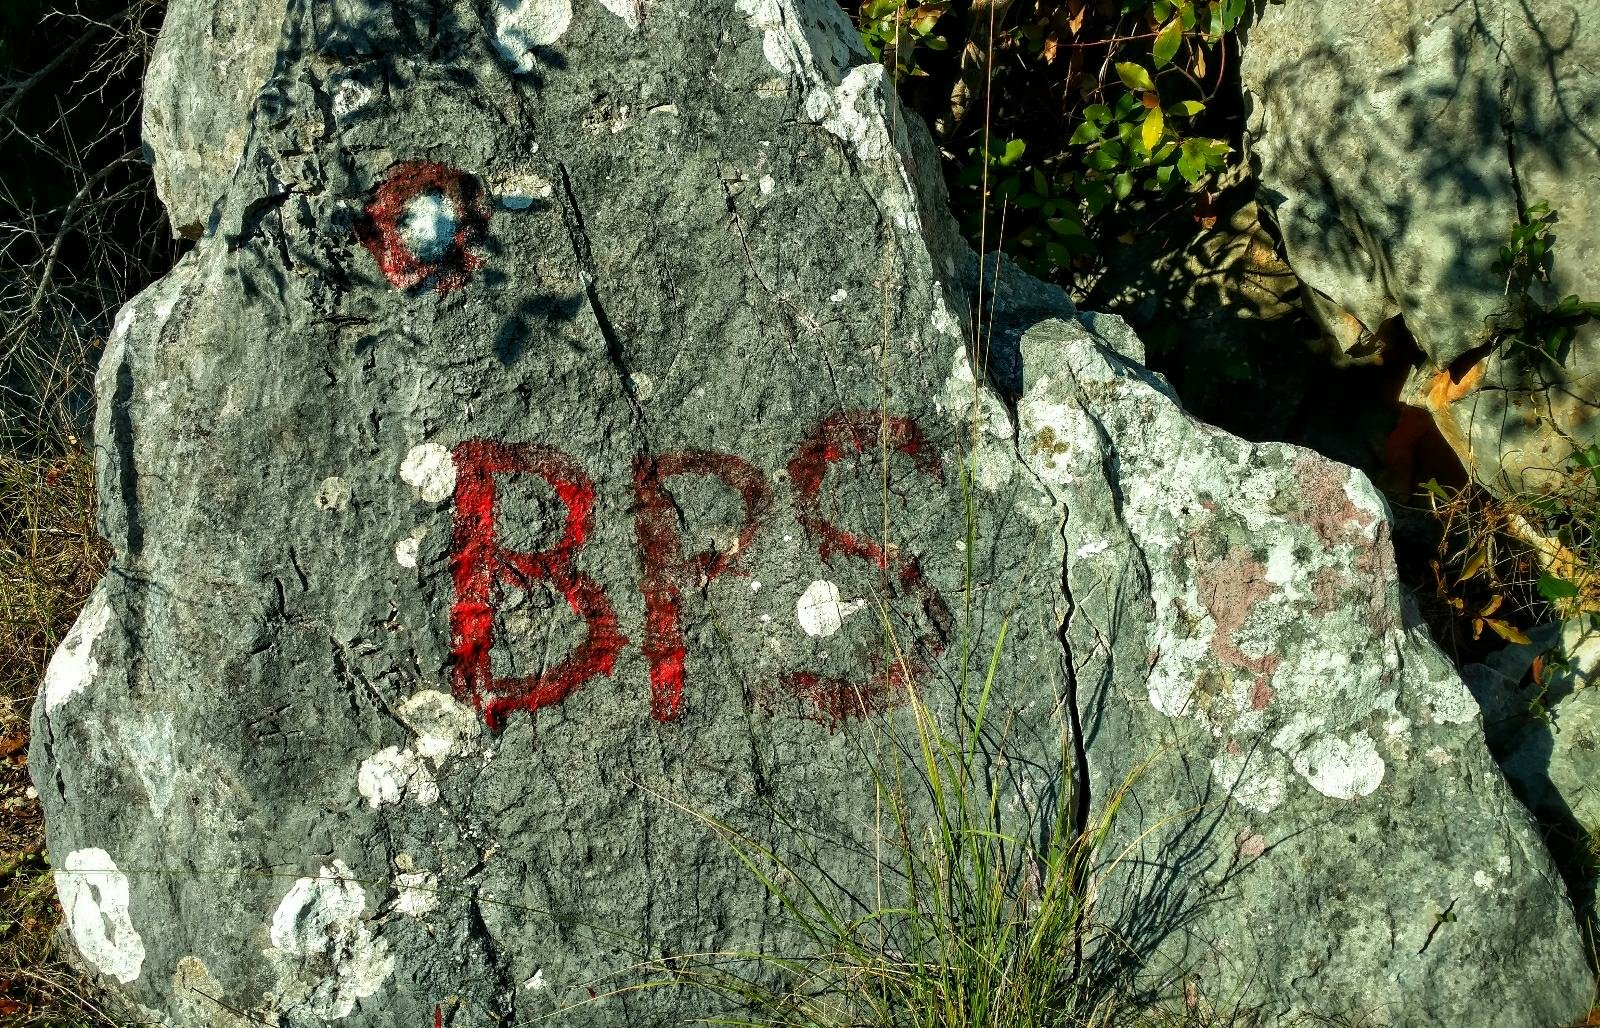 Biokovo Planinarske Staze BPS | Biokovo Hiking Trail